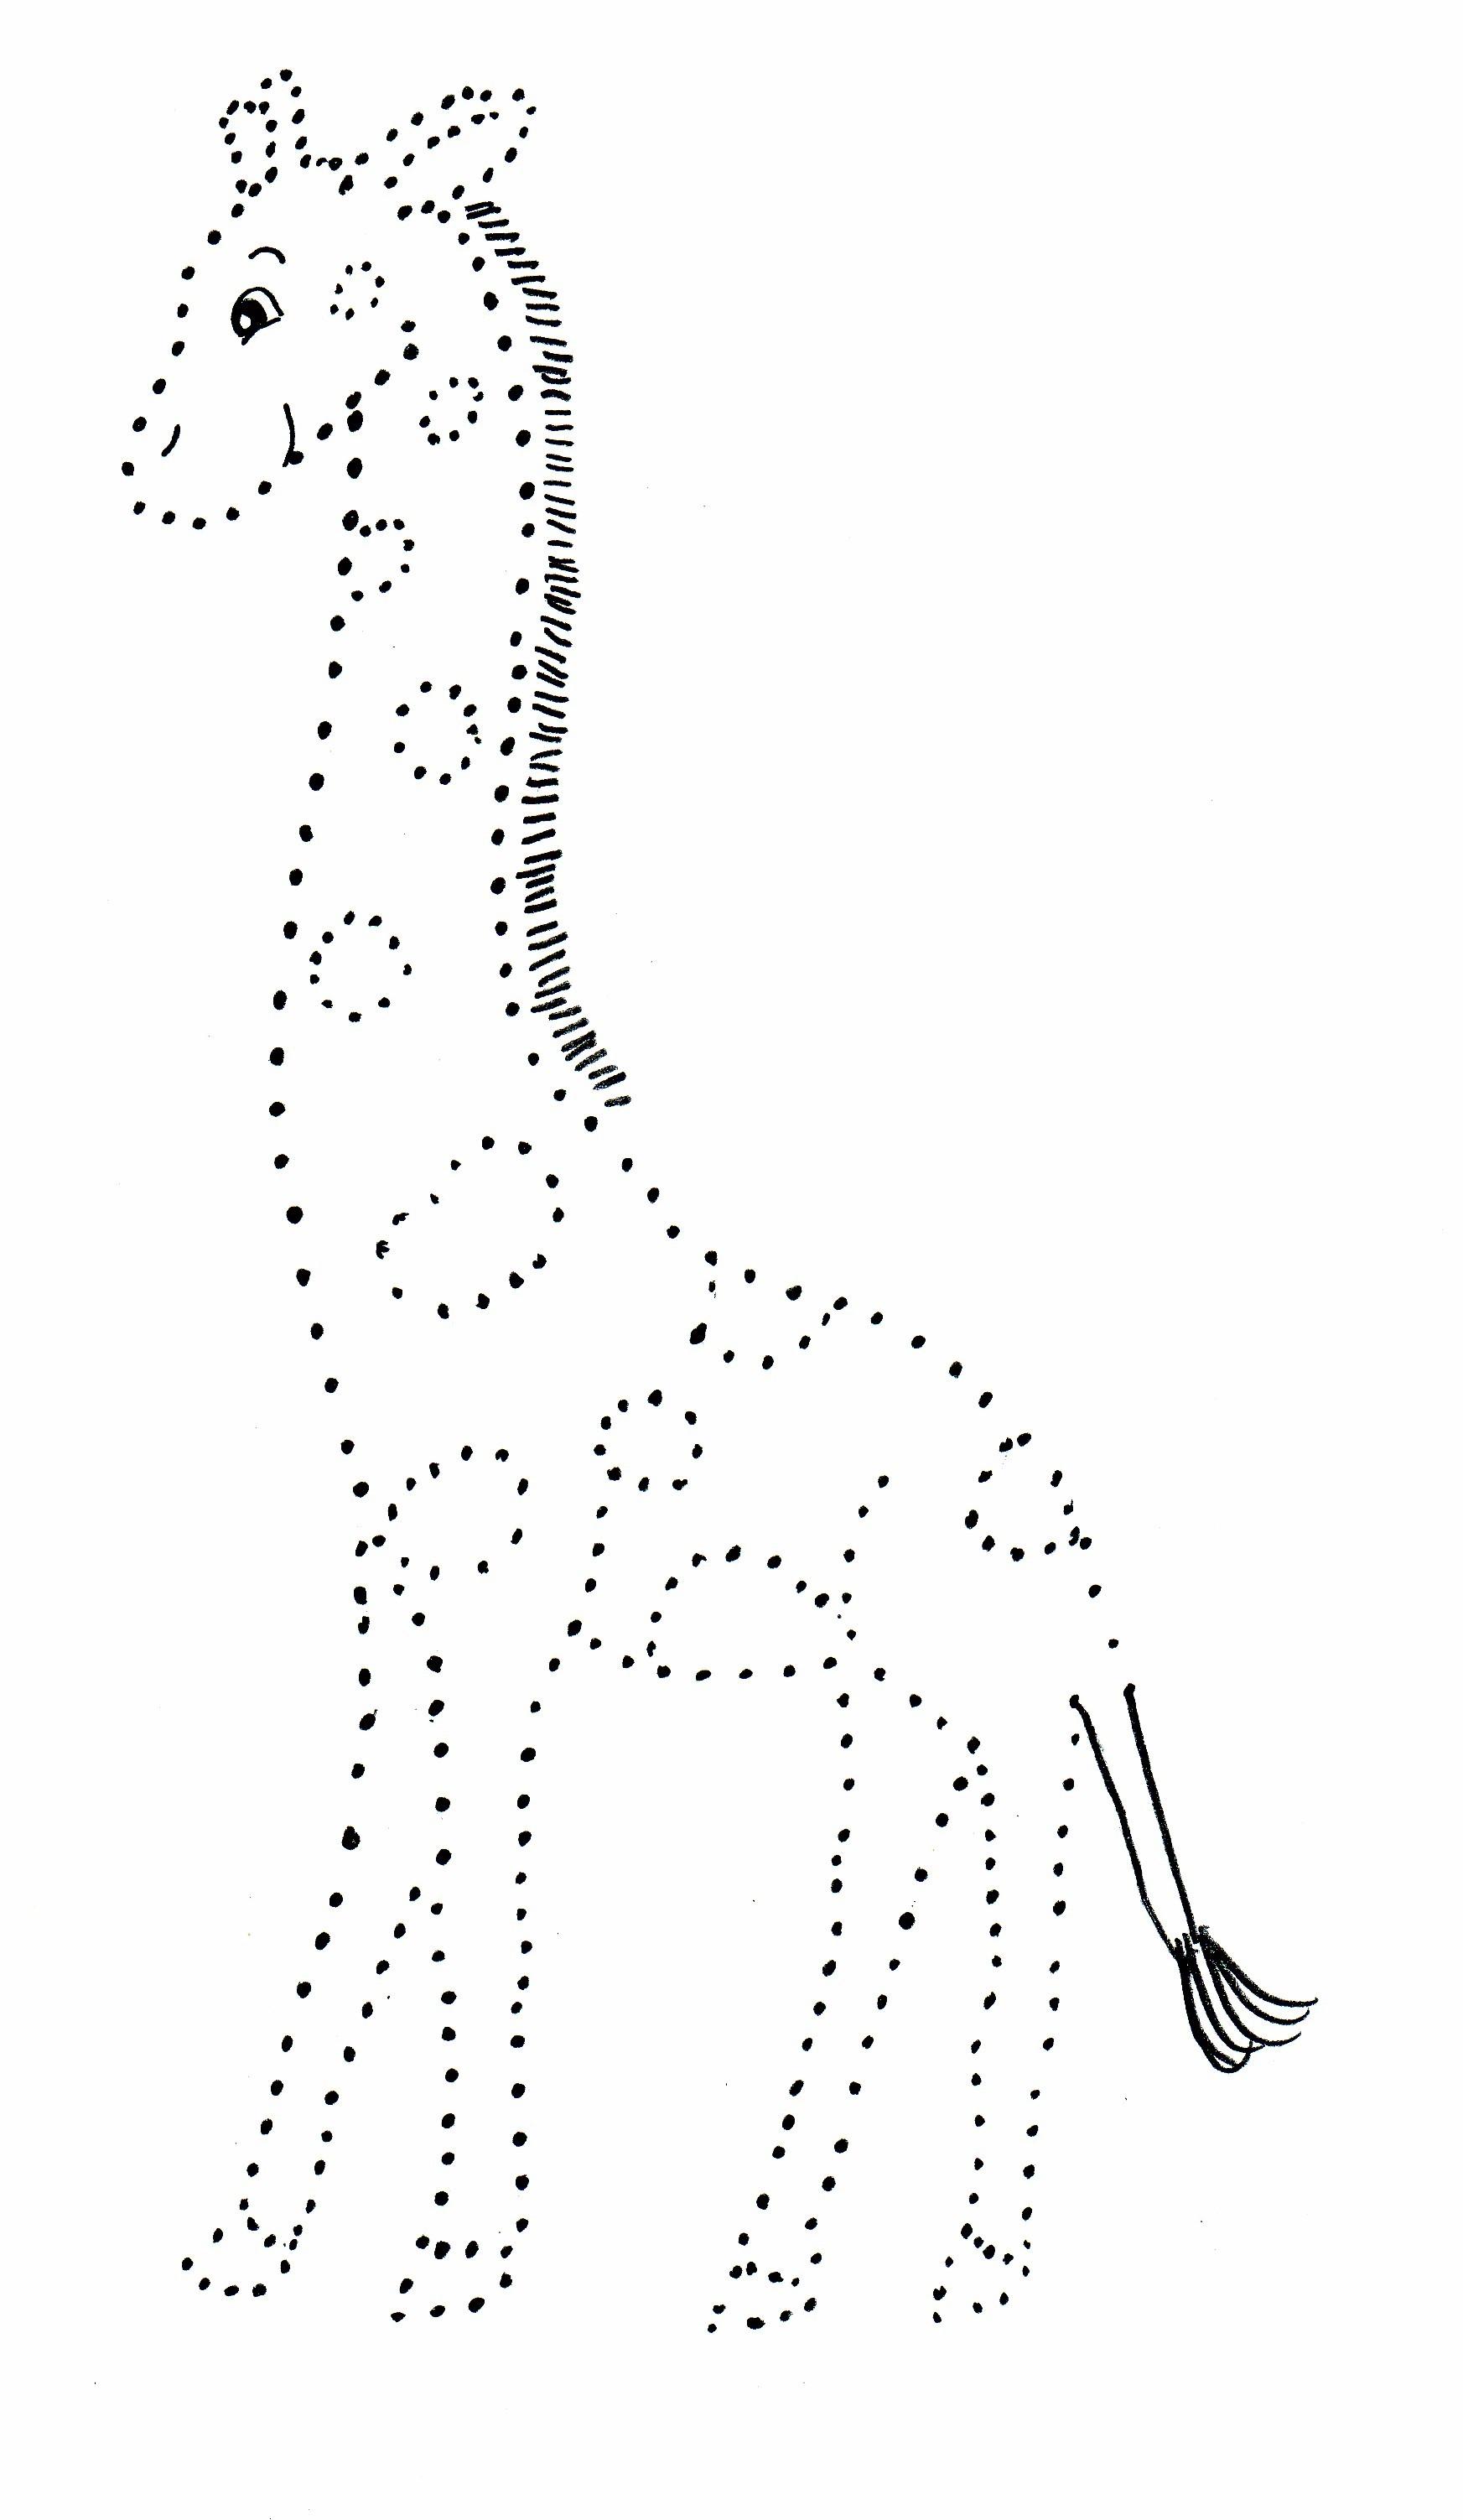 Giraffe Dot Drawing